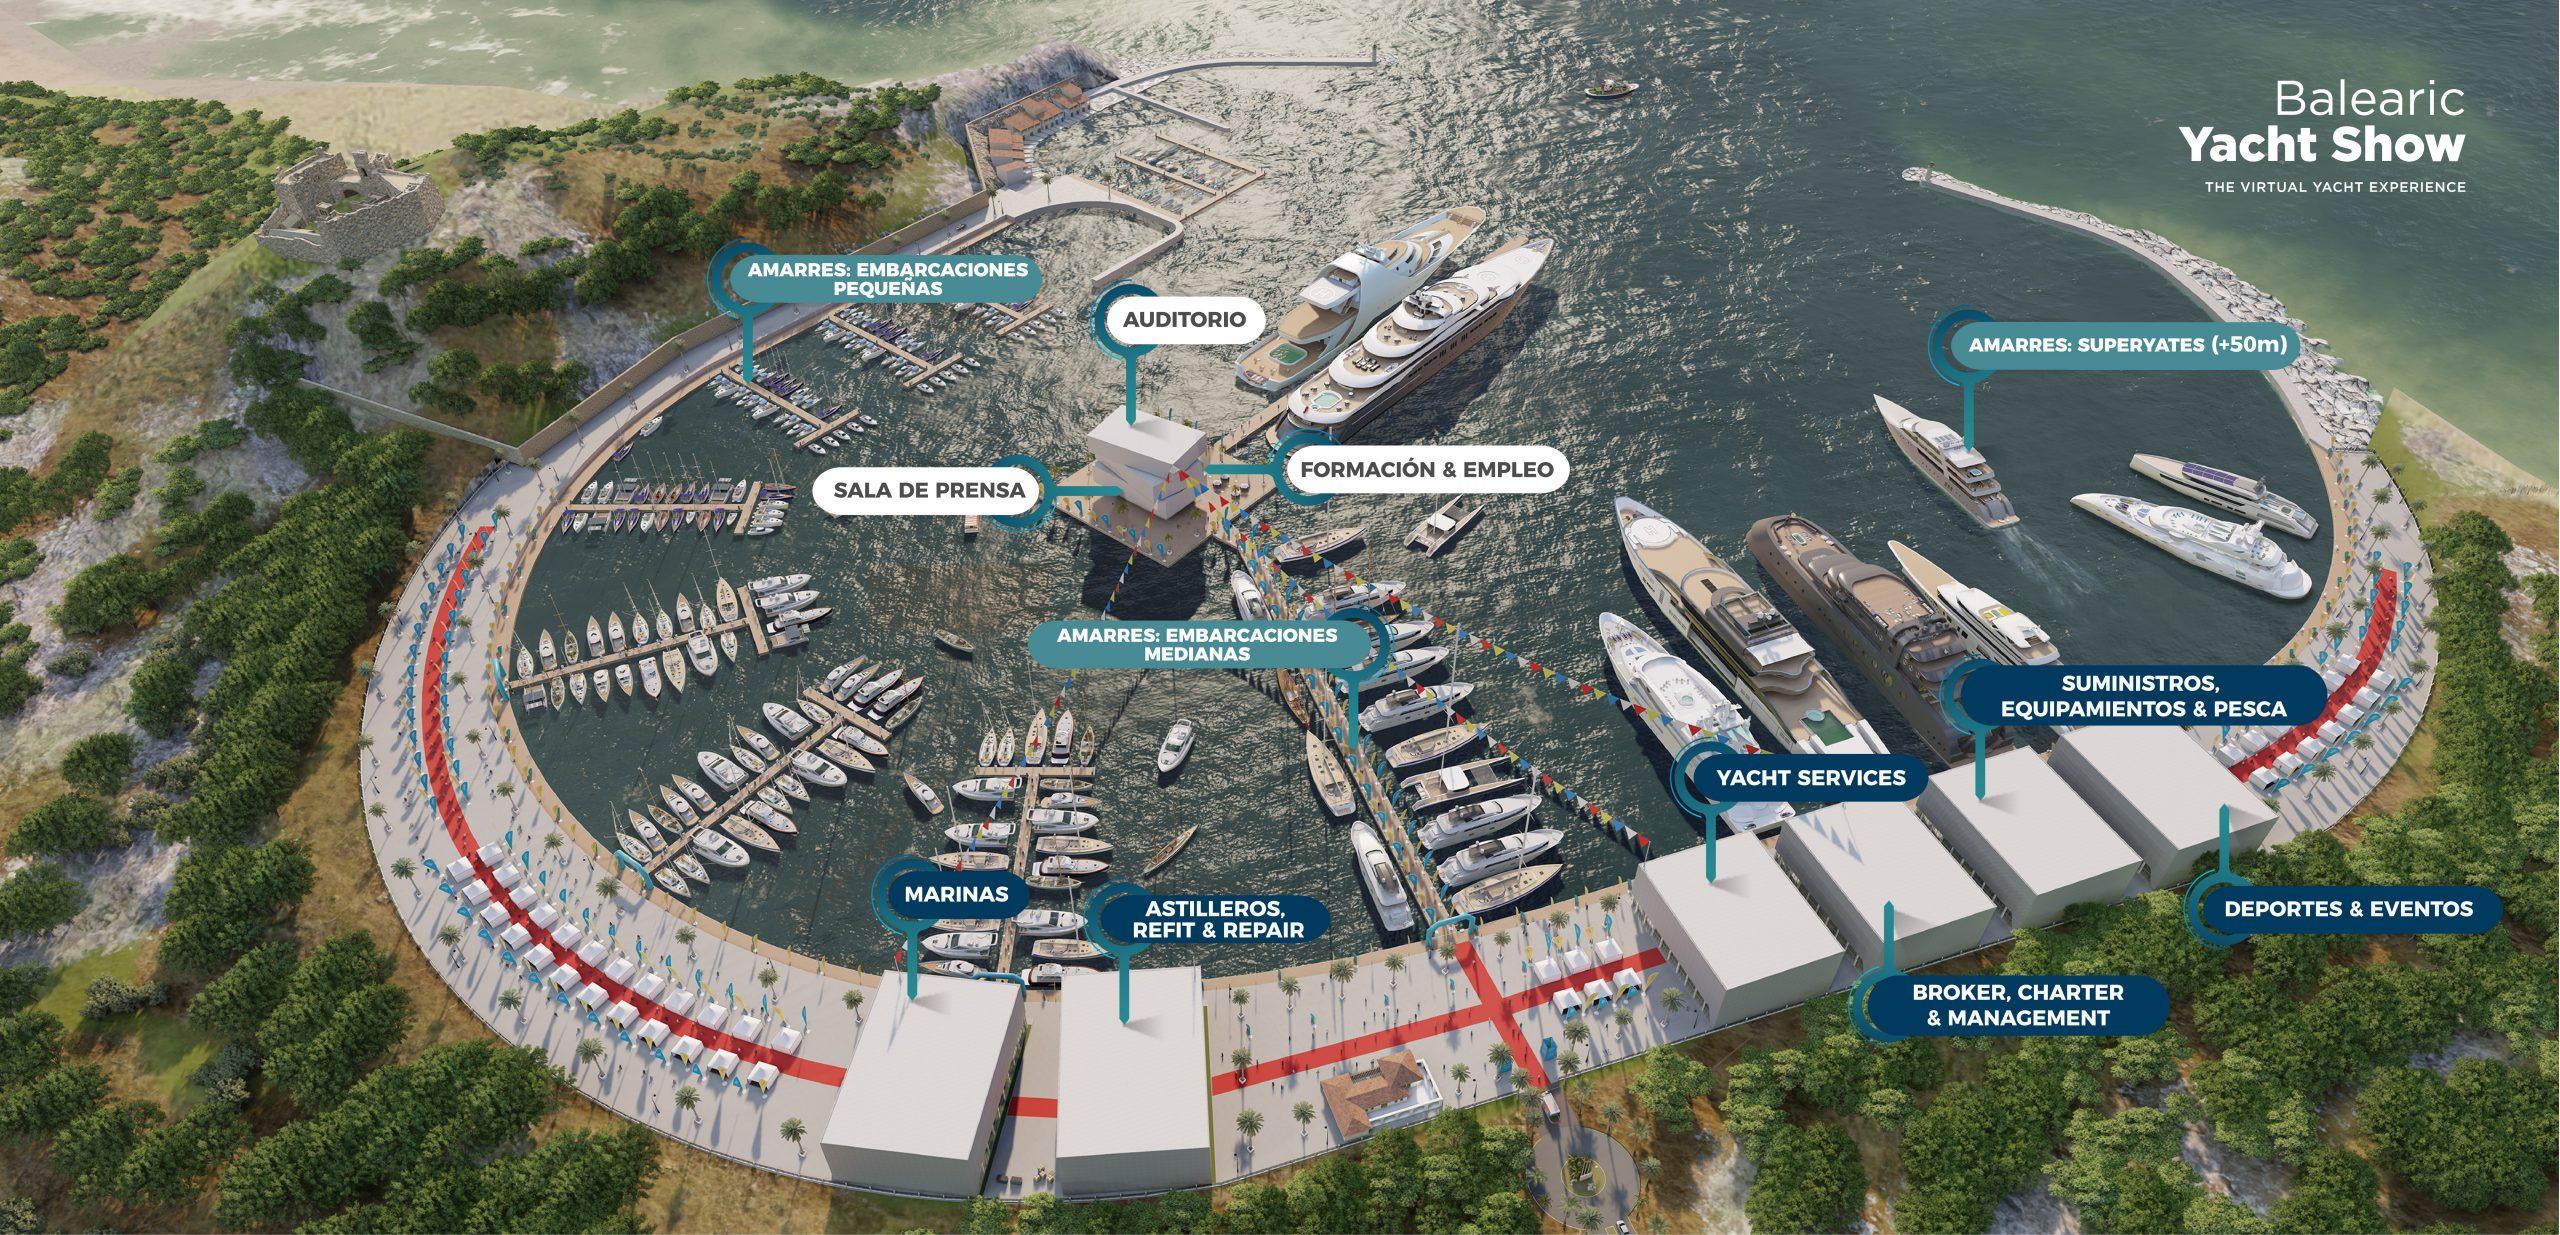 Balearic Yacht Show calienta motores para su fase final